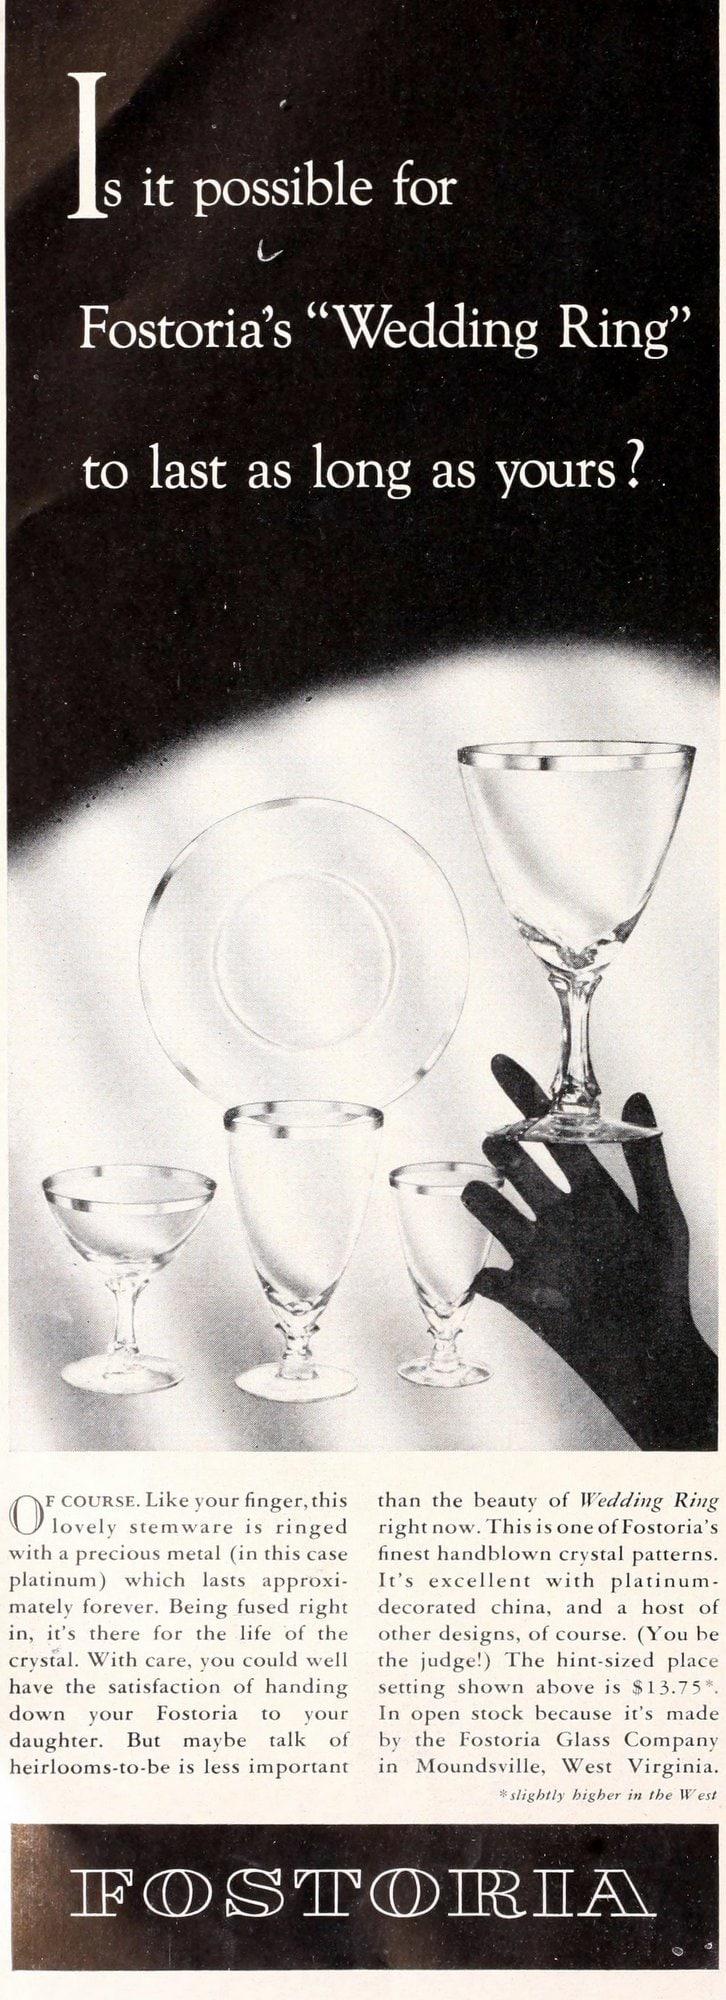 Vintage 1950s Fostoria Wedding Ring glassware (1955)